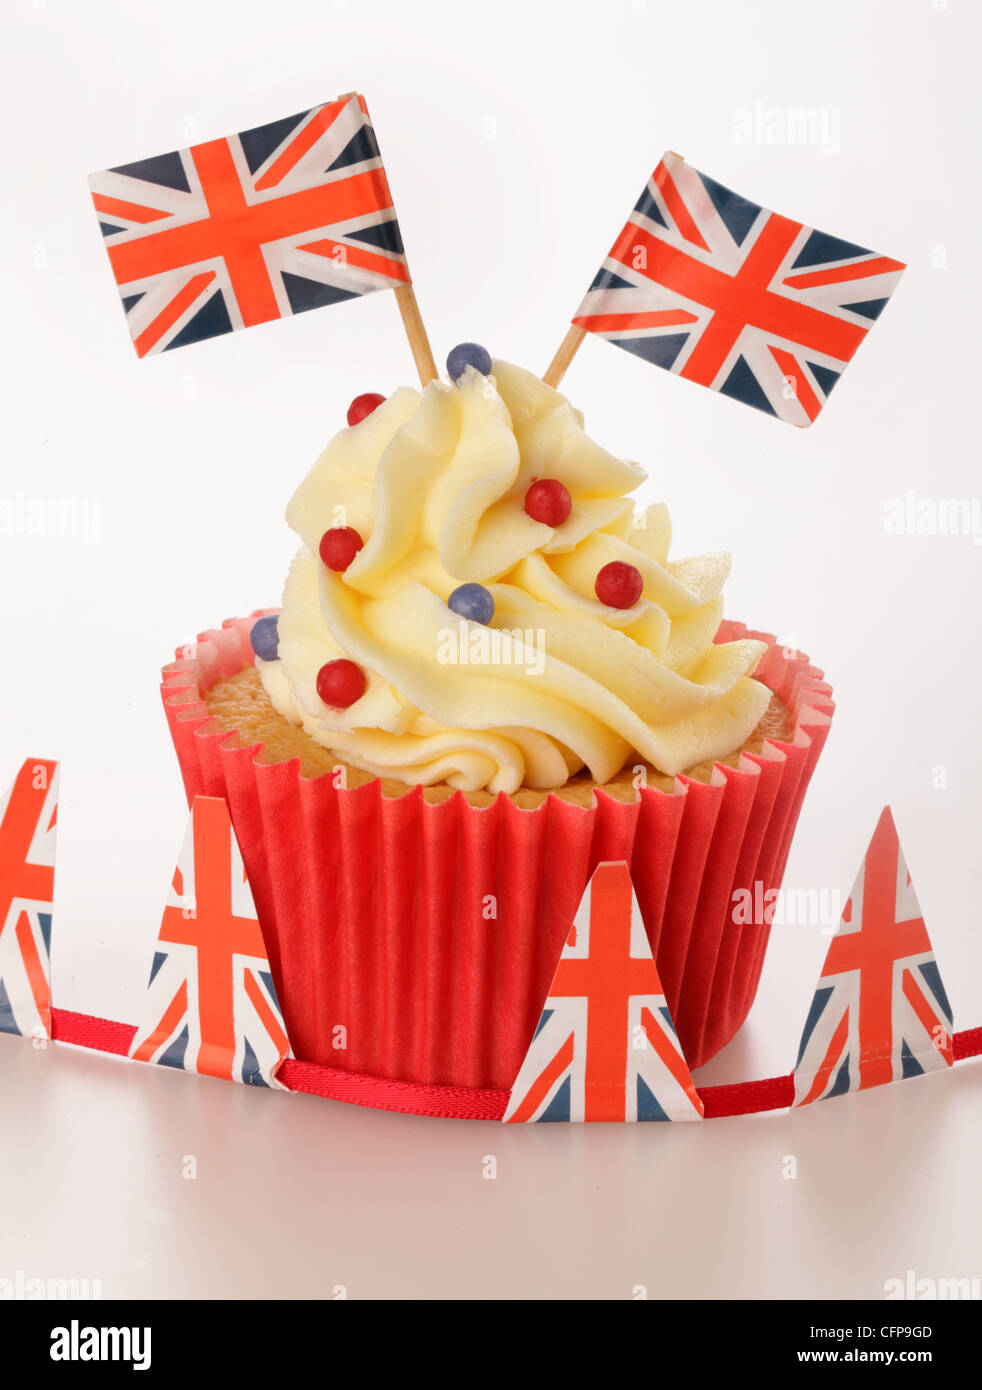 BRITISH CELEBRATION CUPCAKE - Stock Image